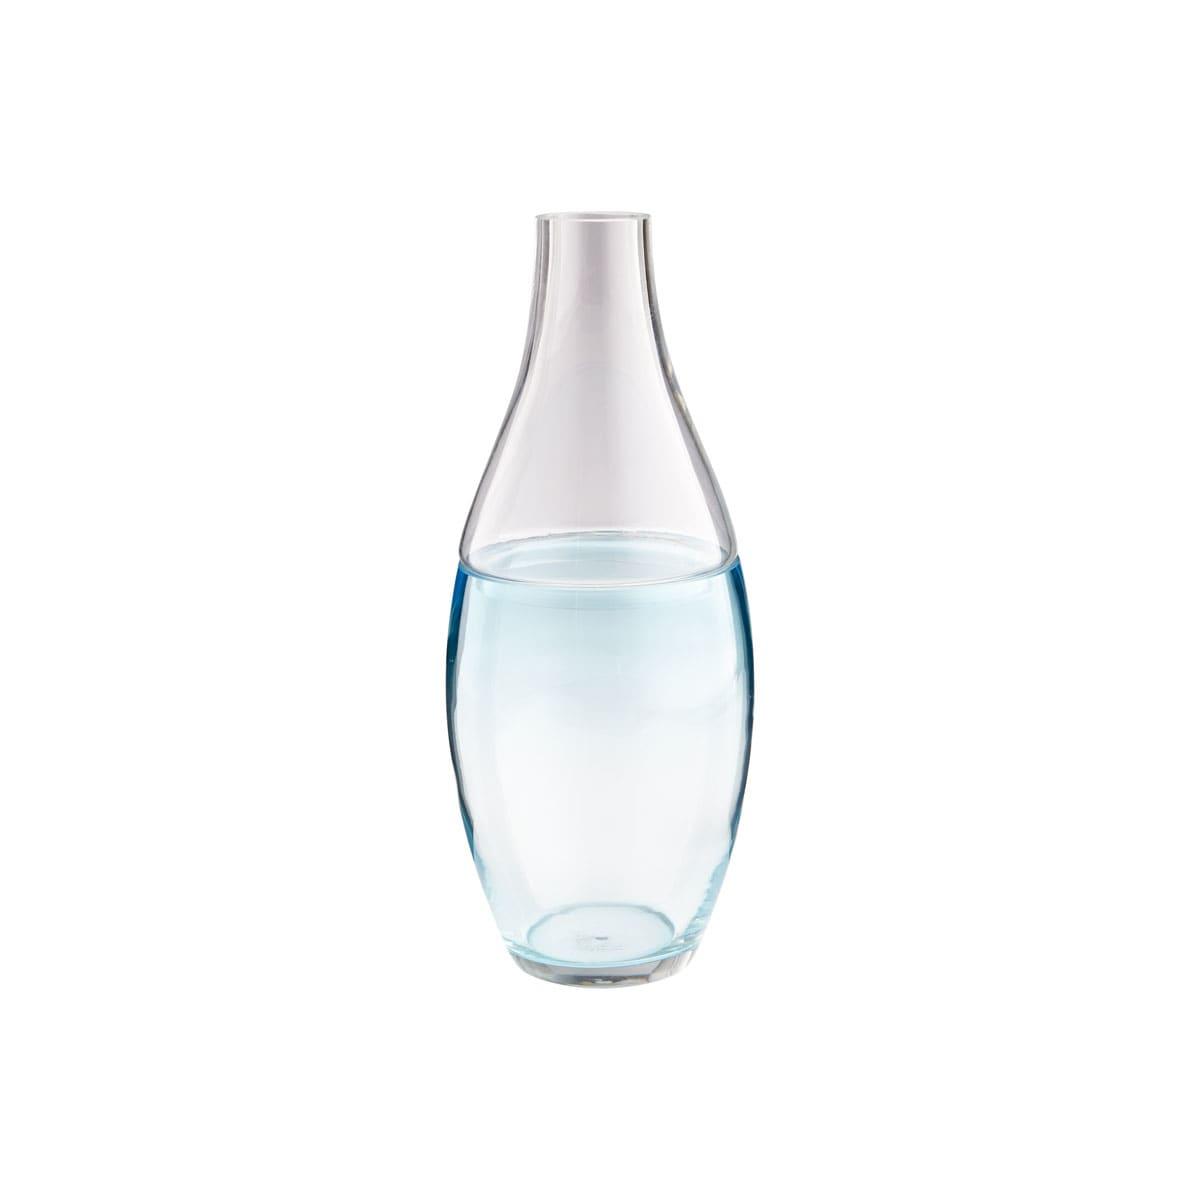 Cyan Design 08608 Blue Clear Blue Mirage 16 5 Inch Tall Glass Vase Lightingdirect Com